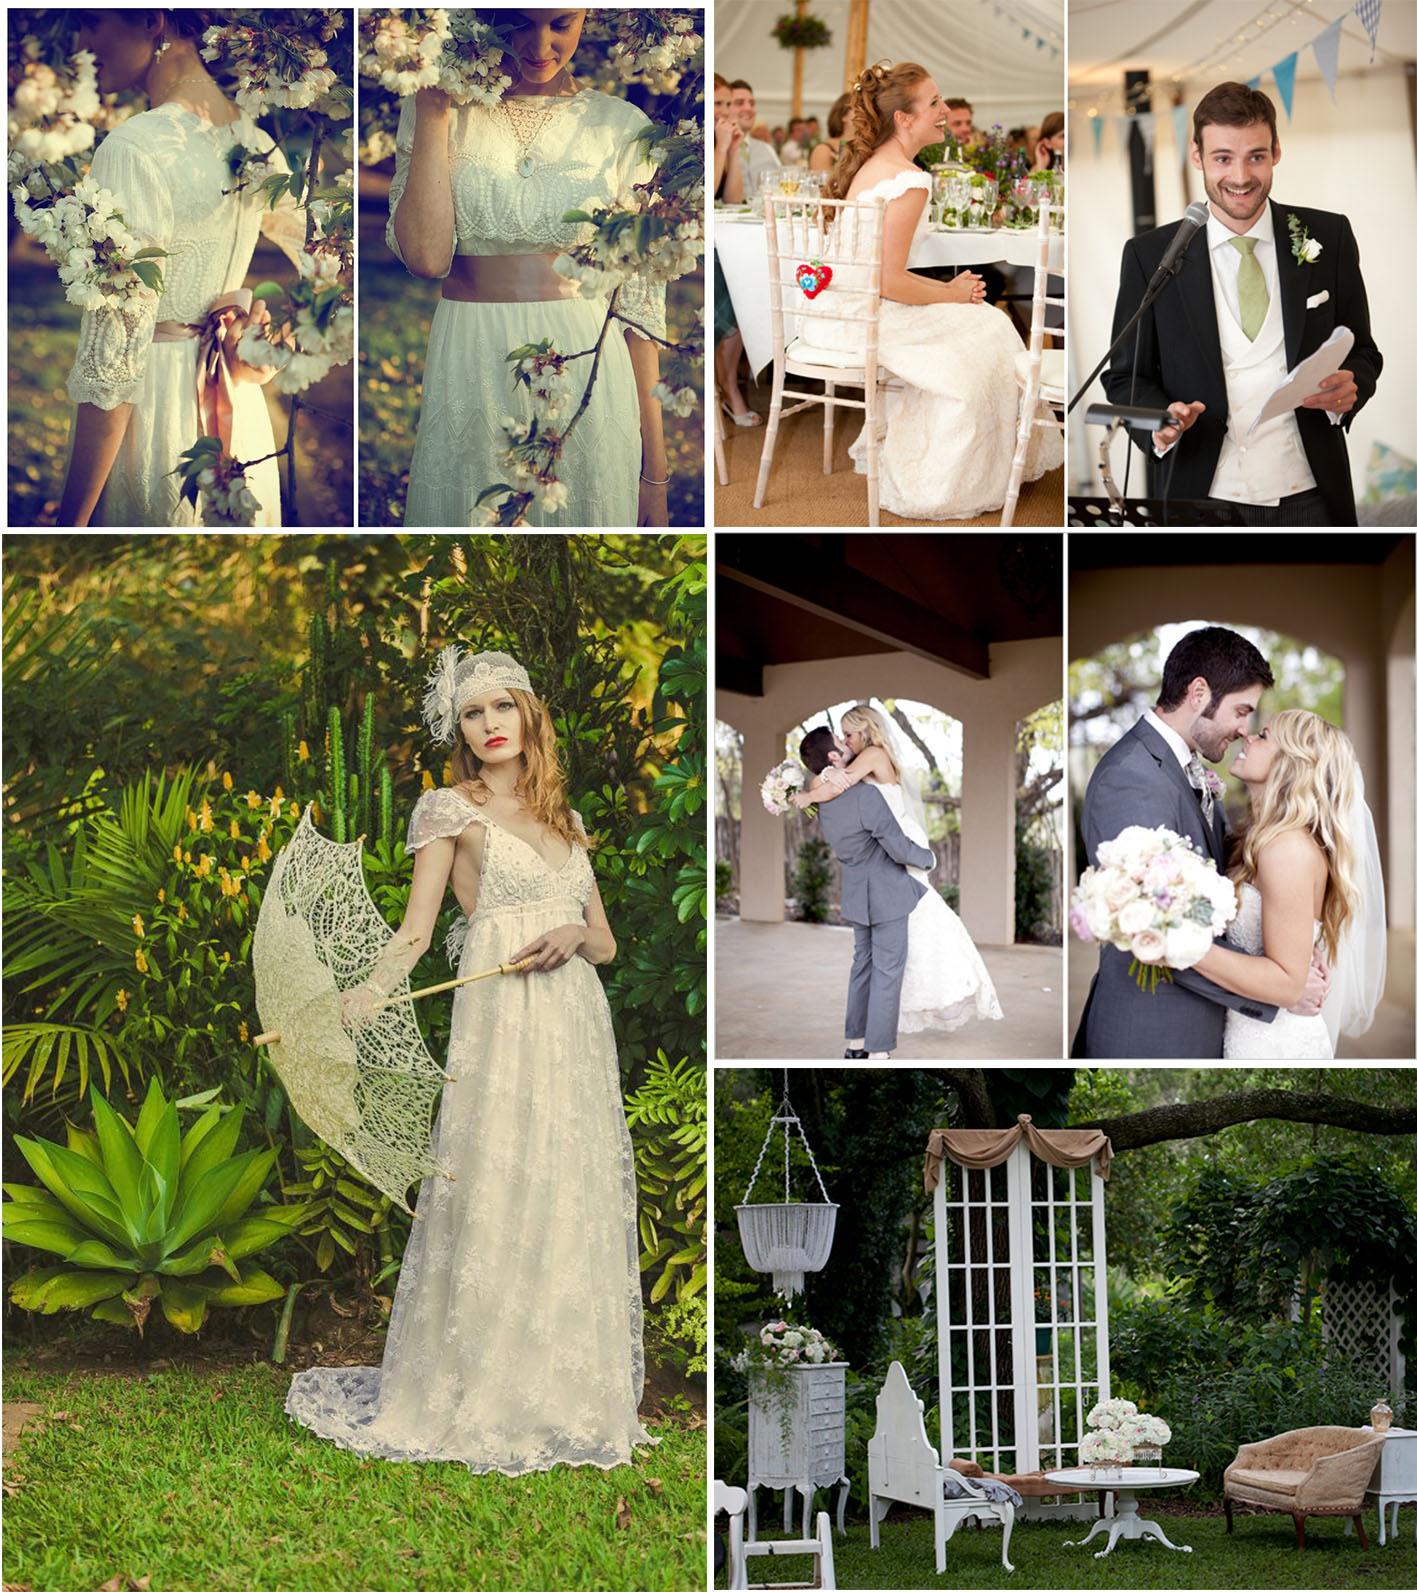 best shabby chic wedding inspirations country chic wedding dresses shabby chic white and green wedding ideas UK